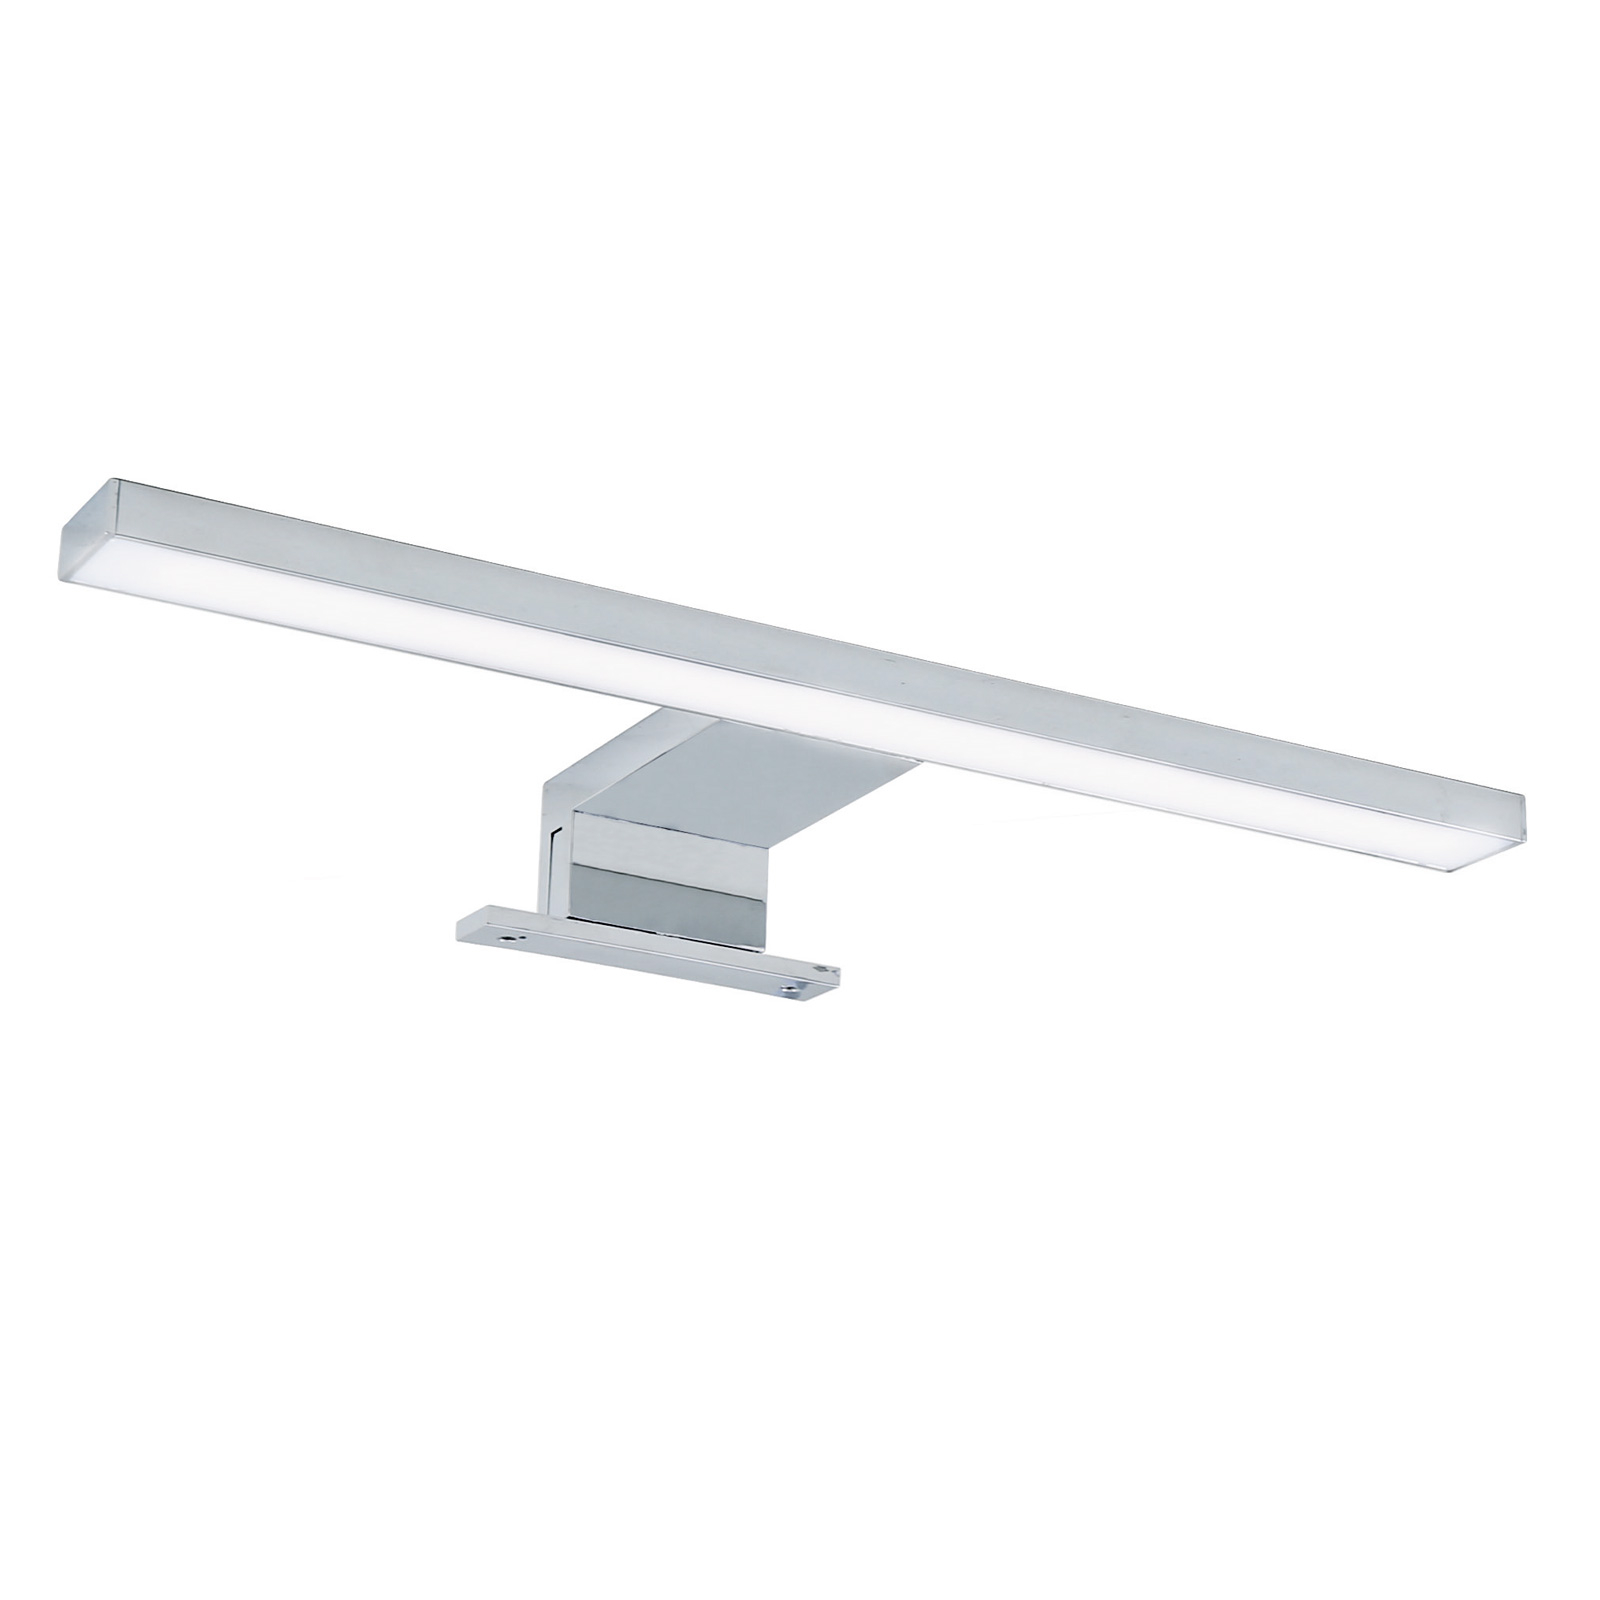 2104 LED mirror light_1510485_1